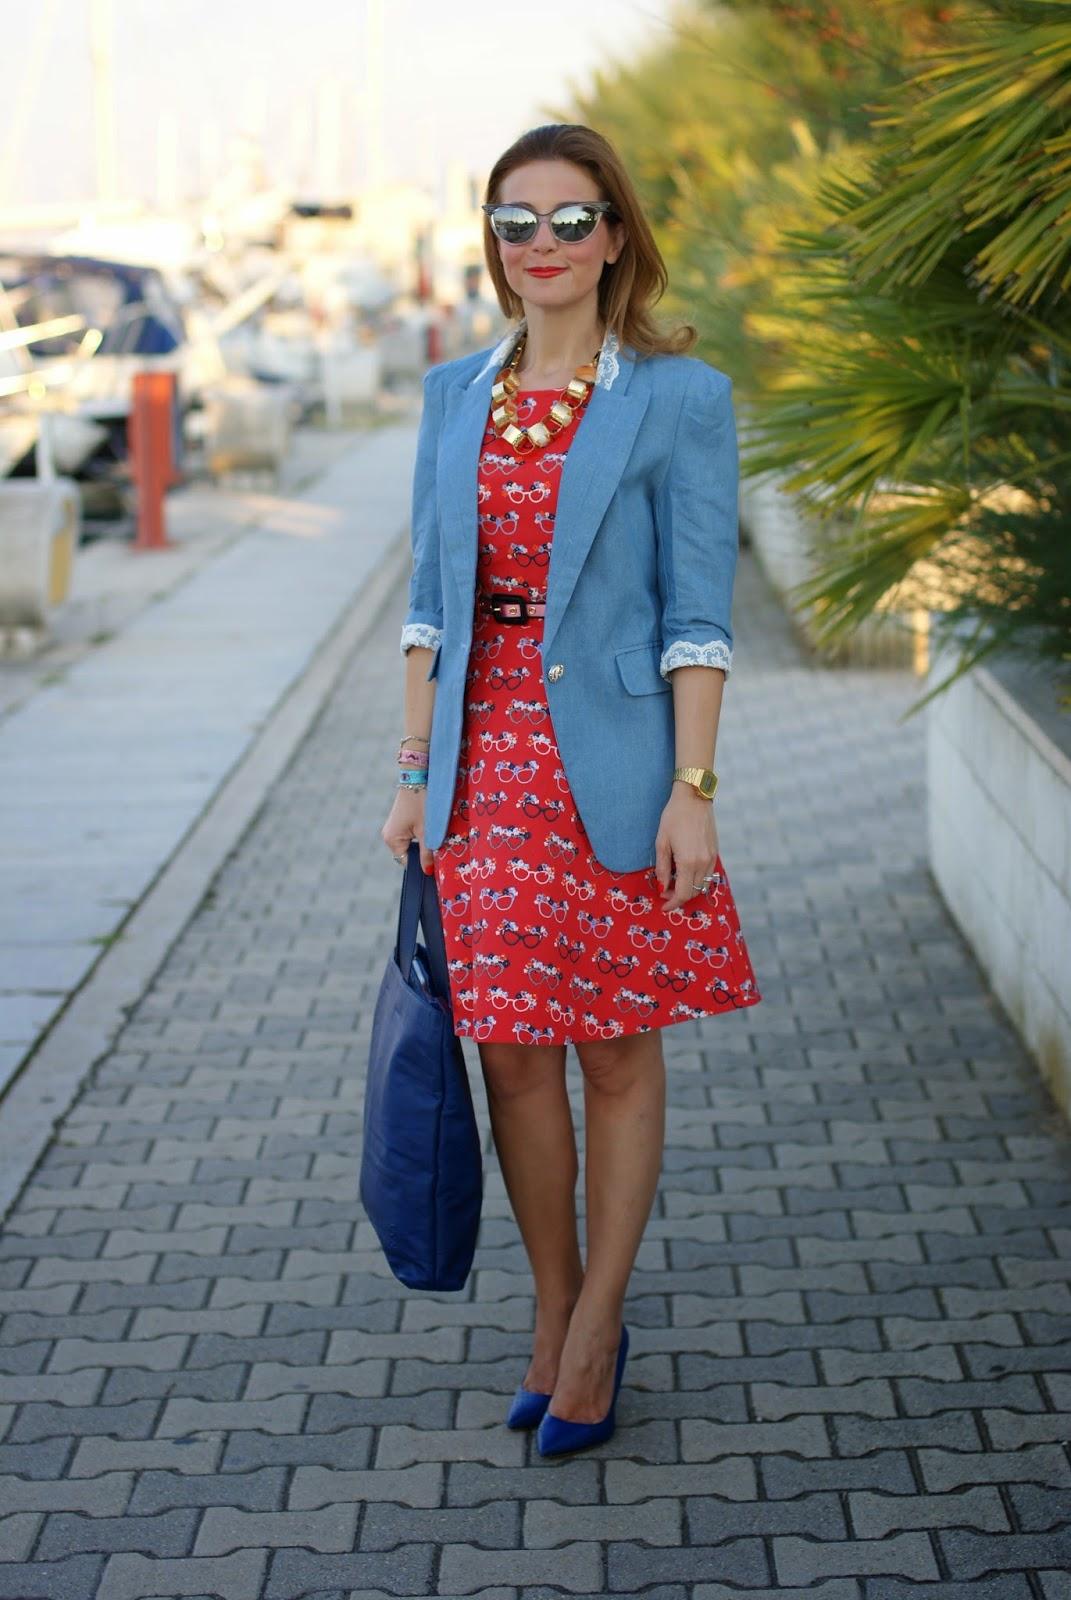 Blackfive denim blazer, nava design shopper bag, sergio levantesi shoes, Fashion and Cookies, fashion blogger